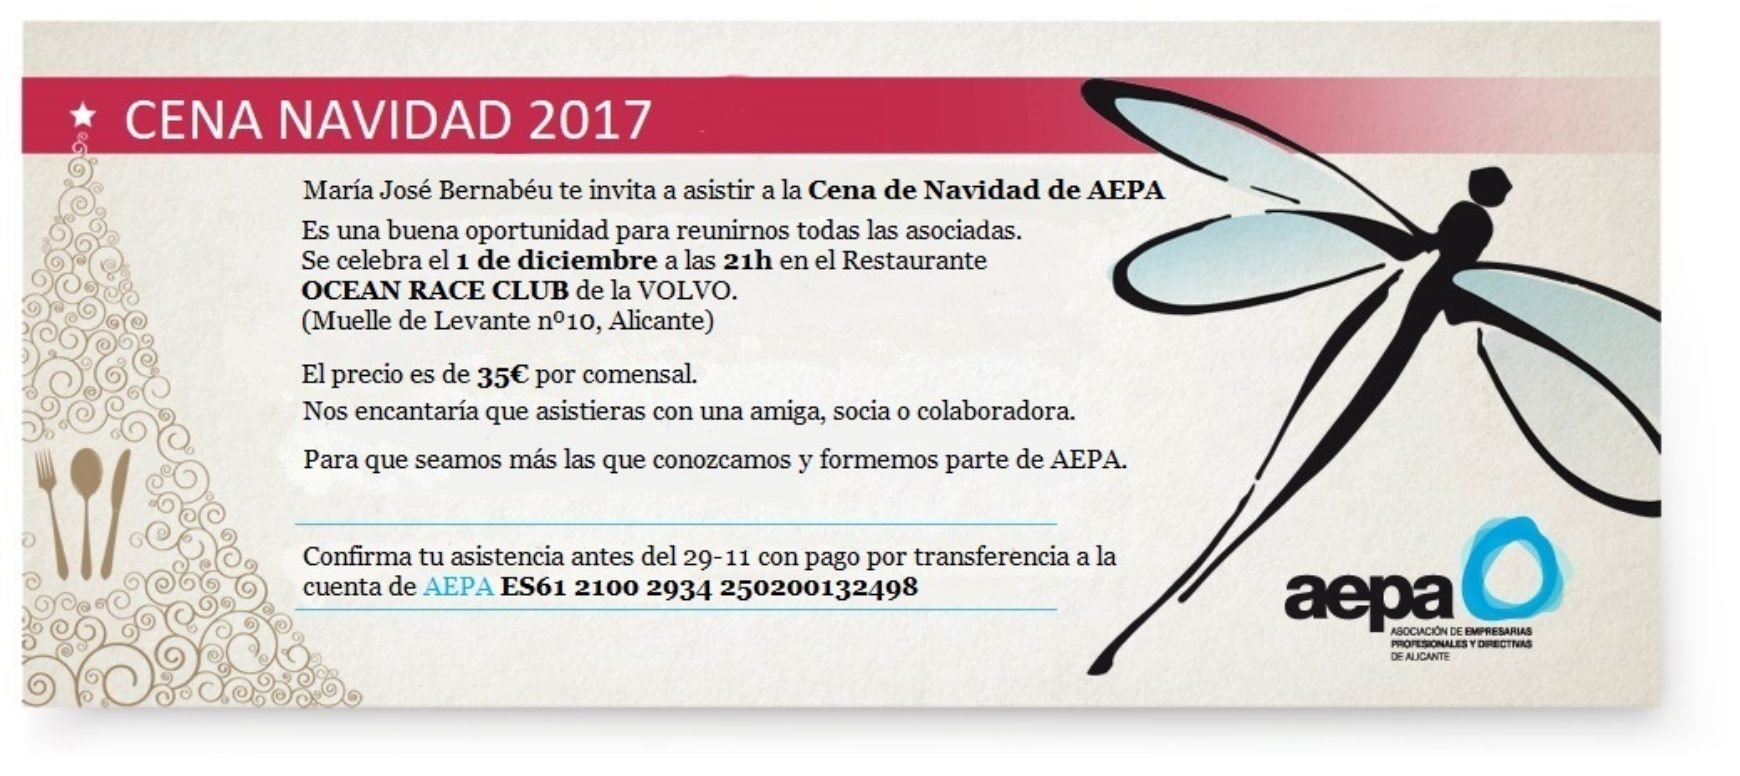 CENA NAVIDAD AEPA 2017